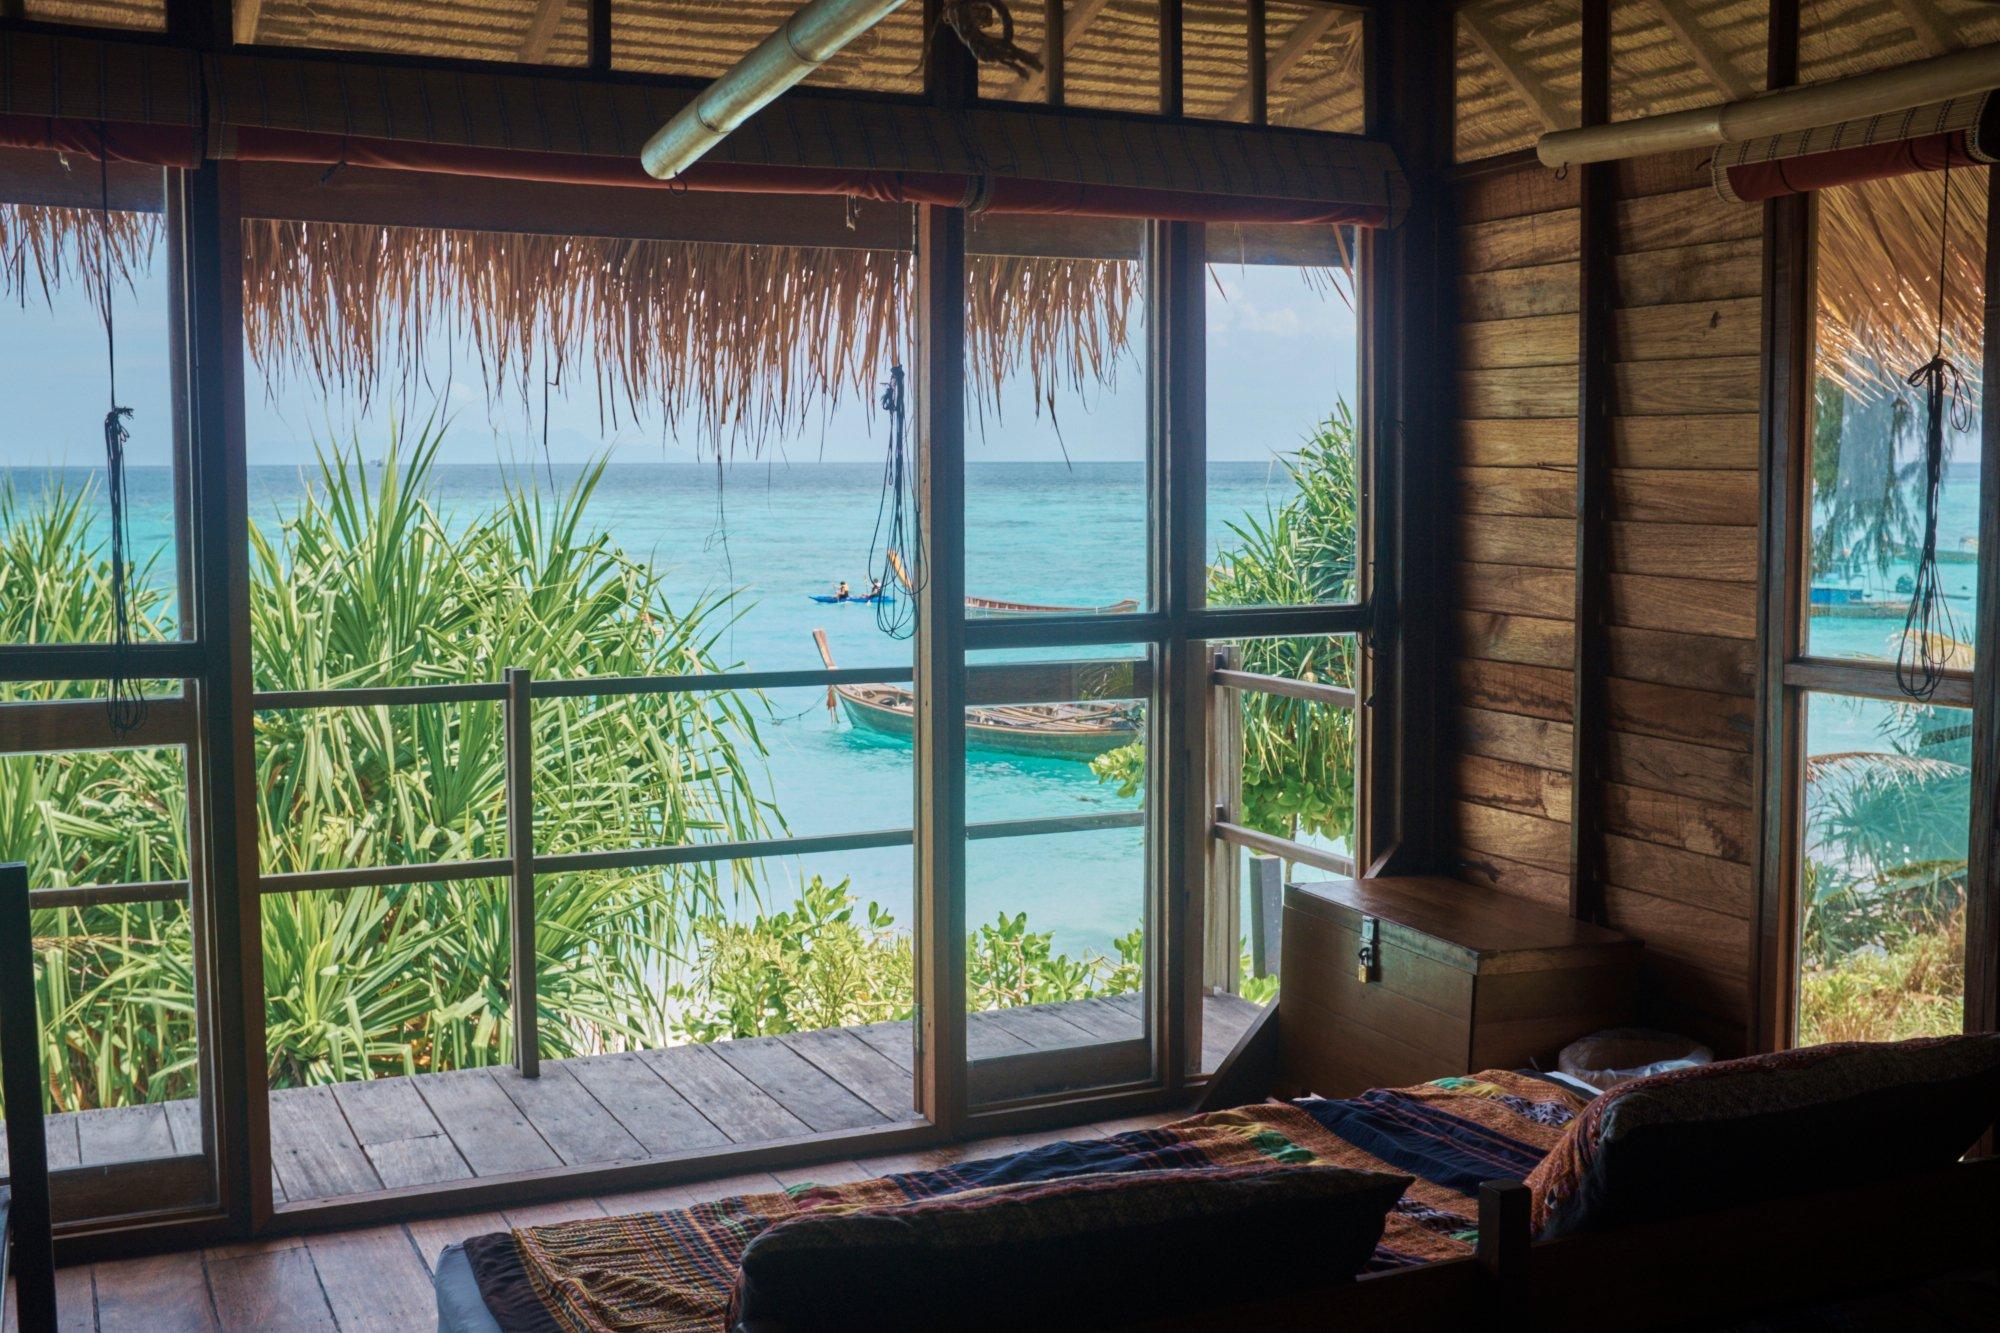 Bamboo garden rooms at lipe beach resort koh lipe - All Photos 1 043